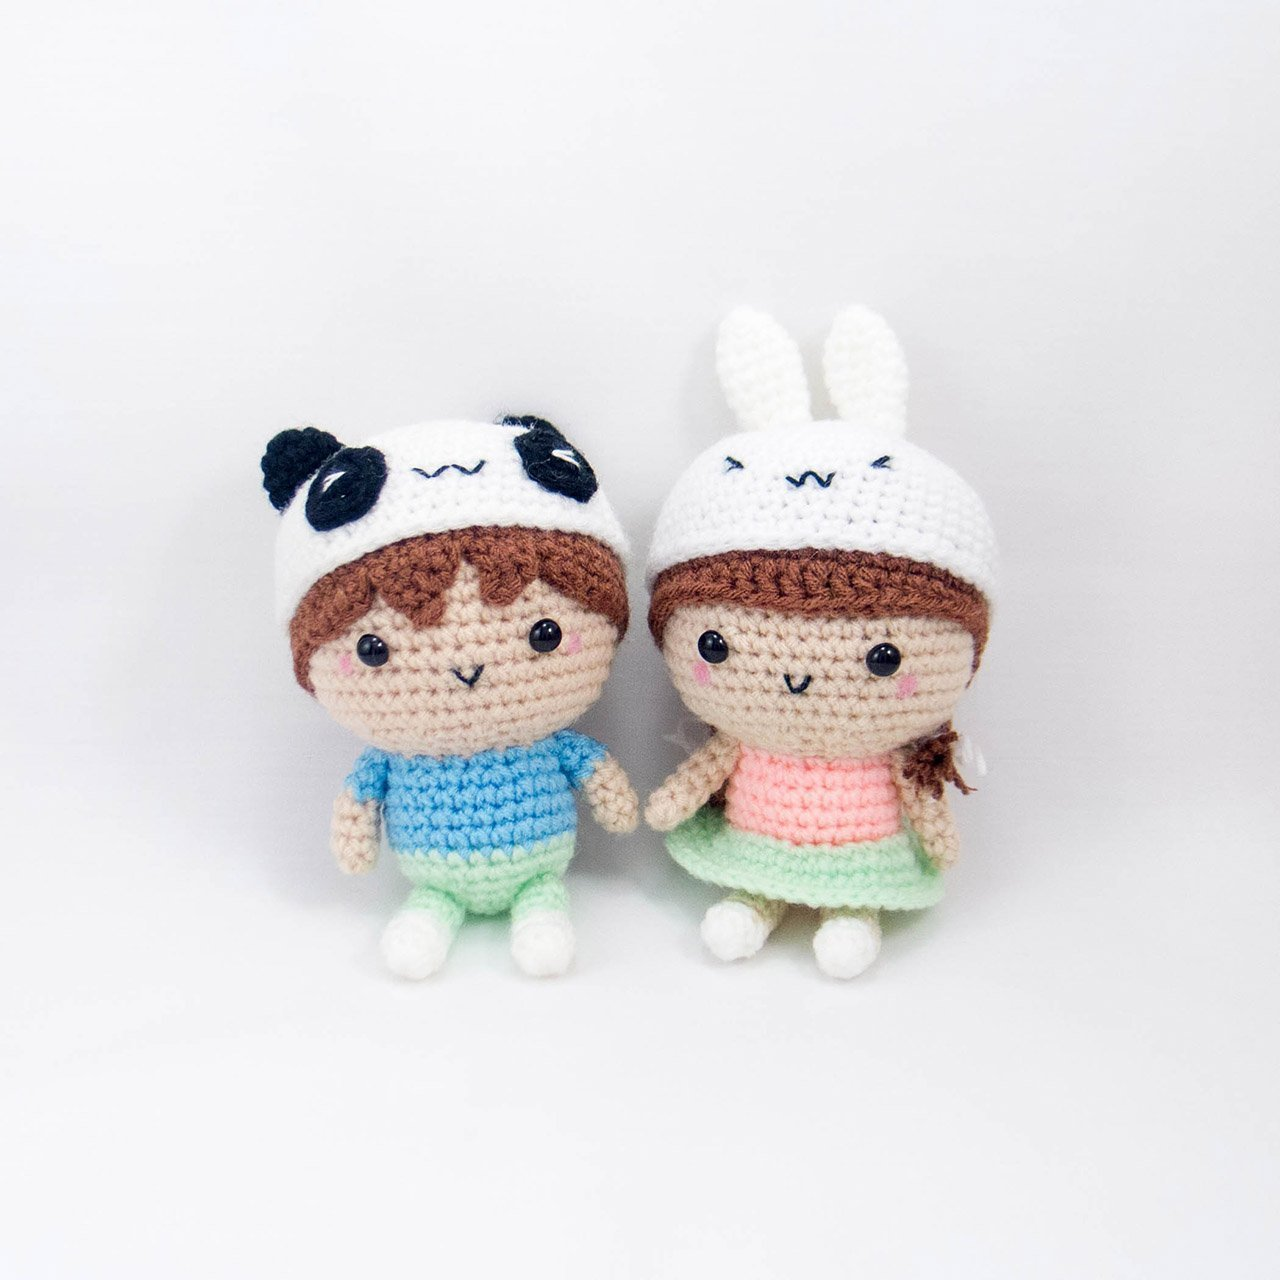 Loving Bride and Groom Wedding Dolls   Crochet dolls free patterns, Wedding  doll, Crochet dolls   1280x1280